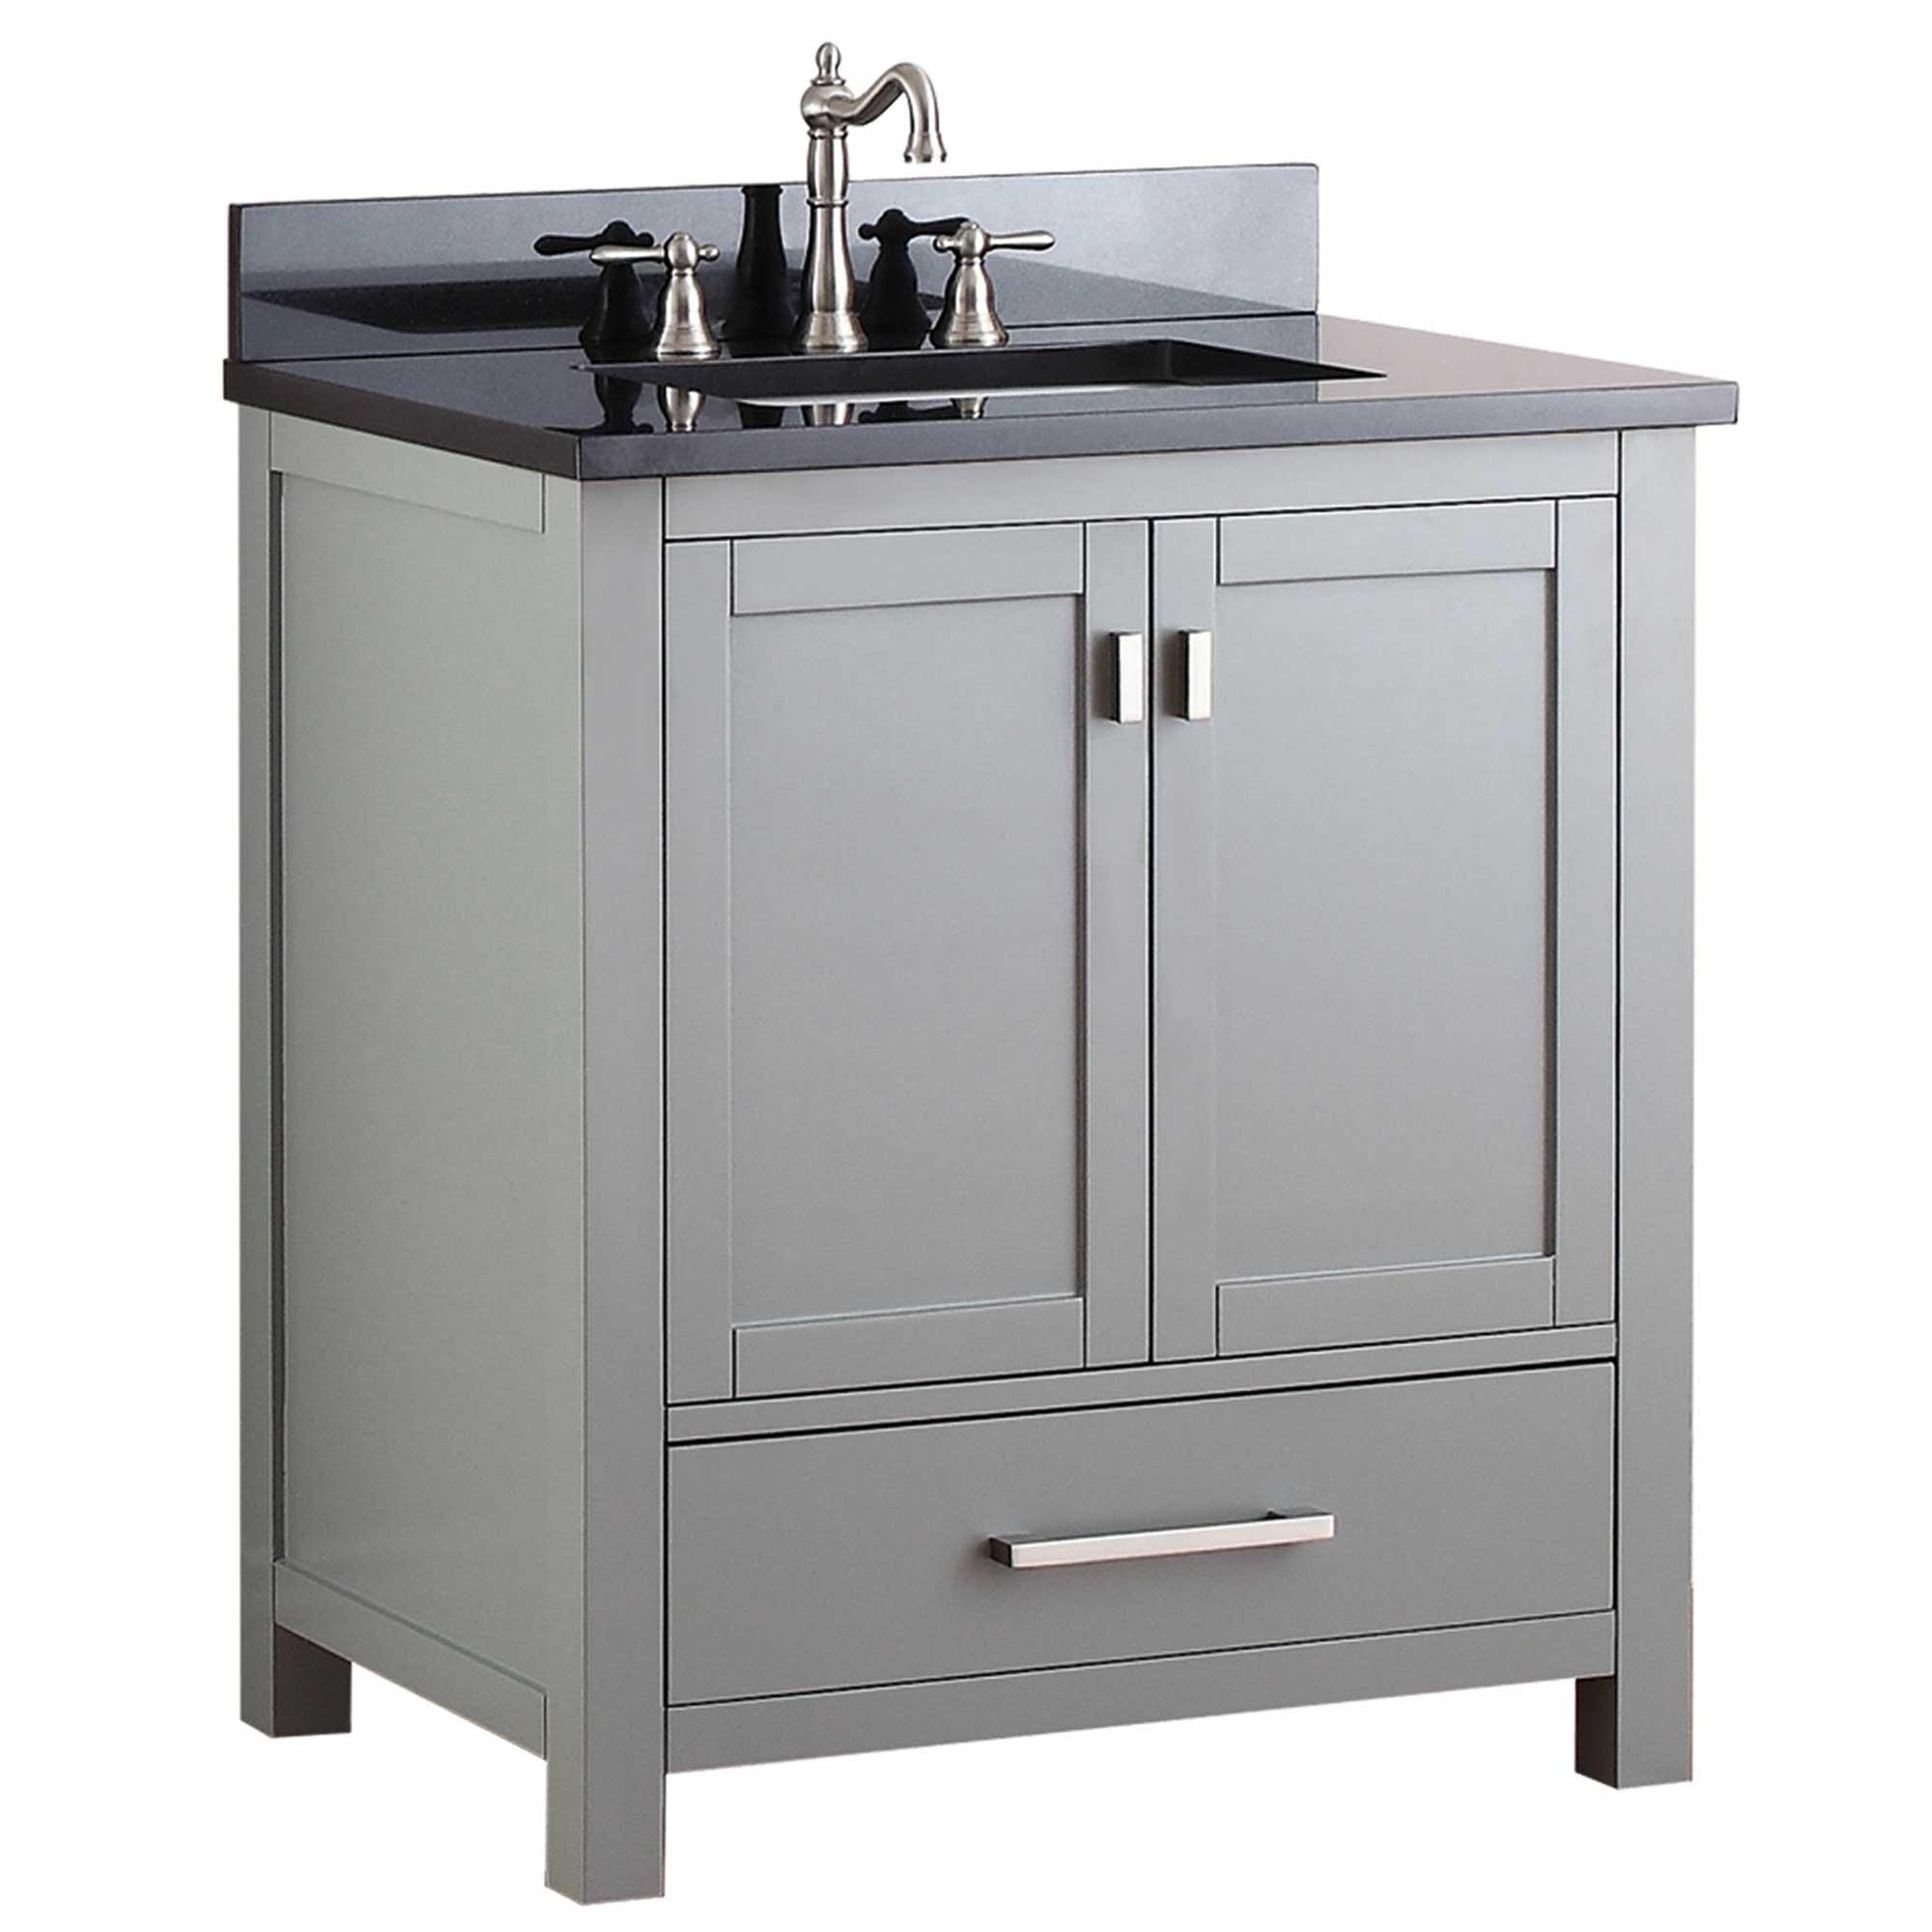 "Bathroom Counter And Sink Combo: 31"" Toscana Single Bath Vanity"